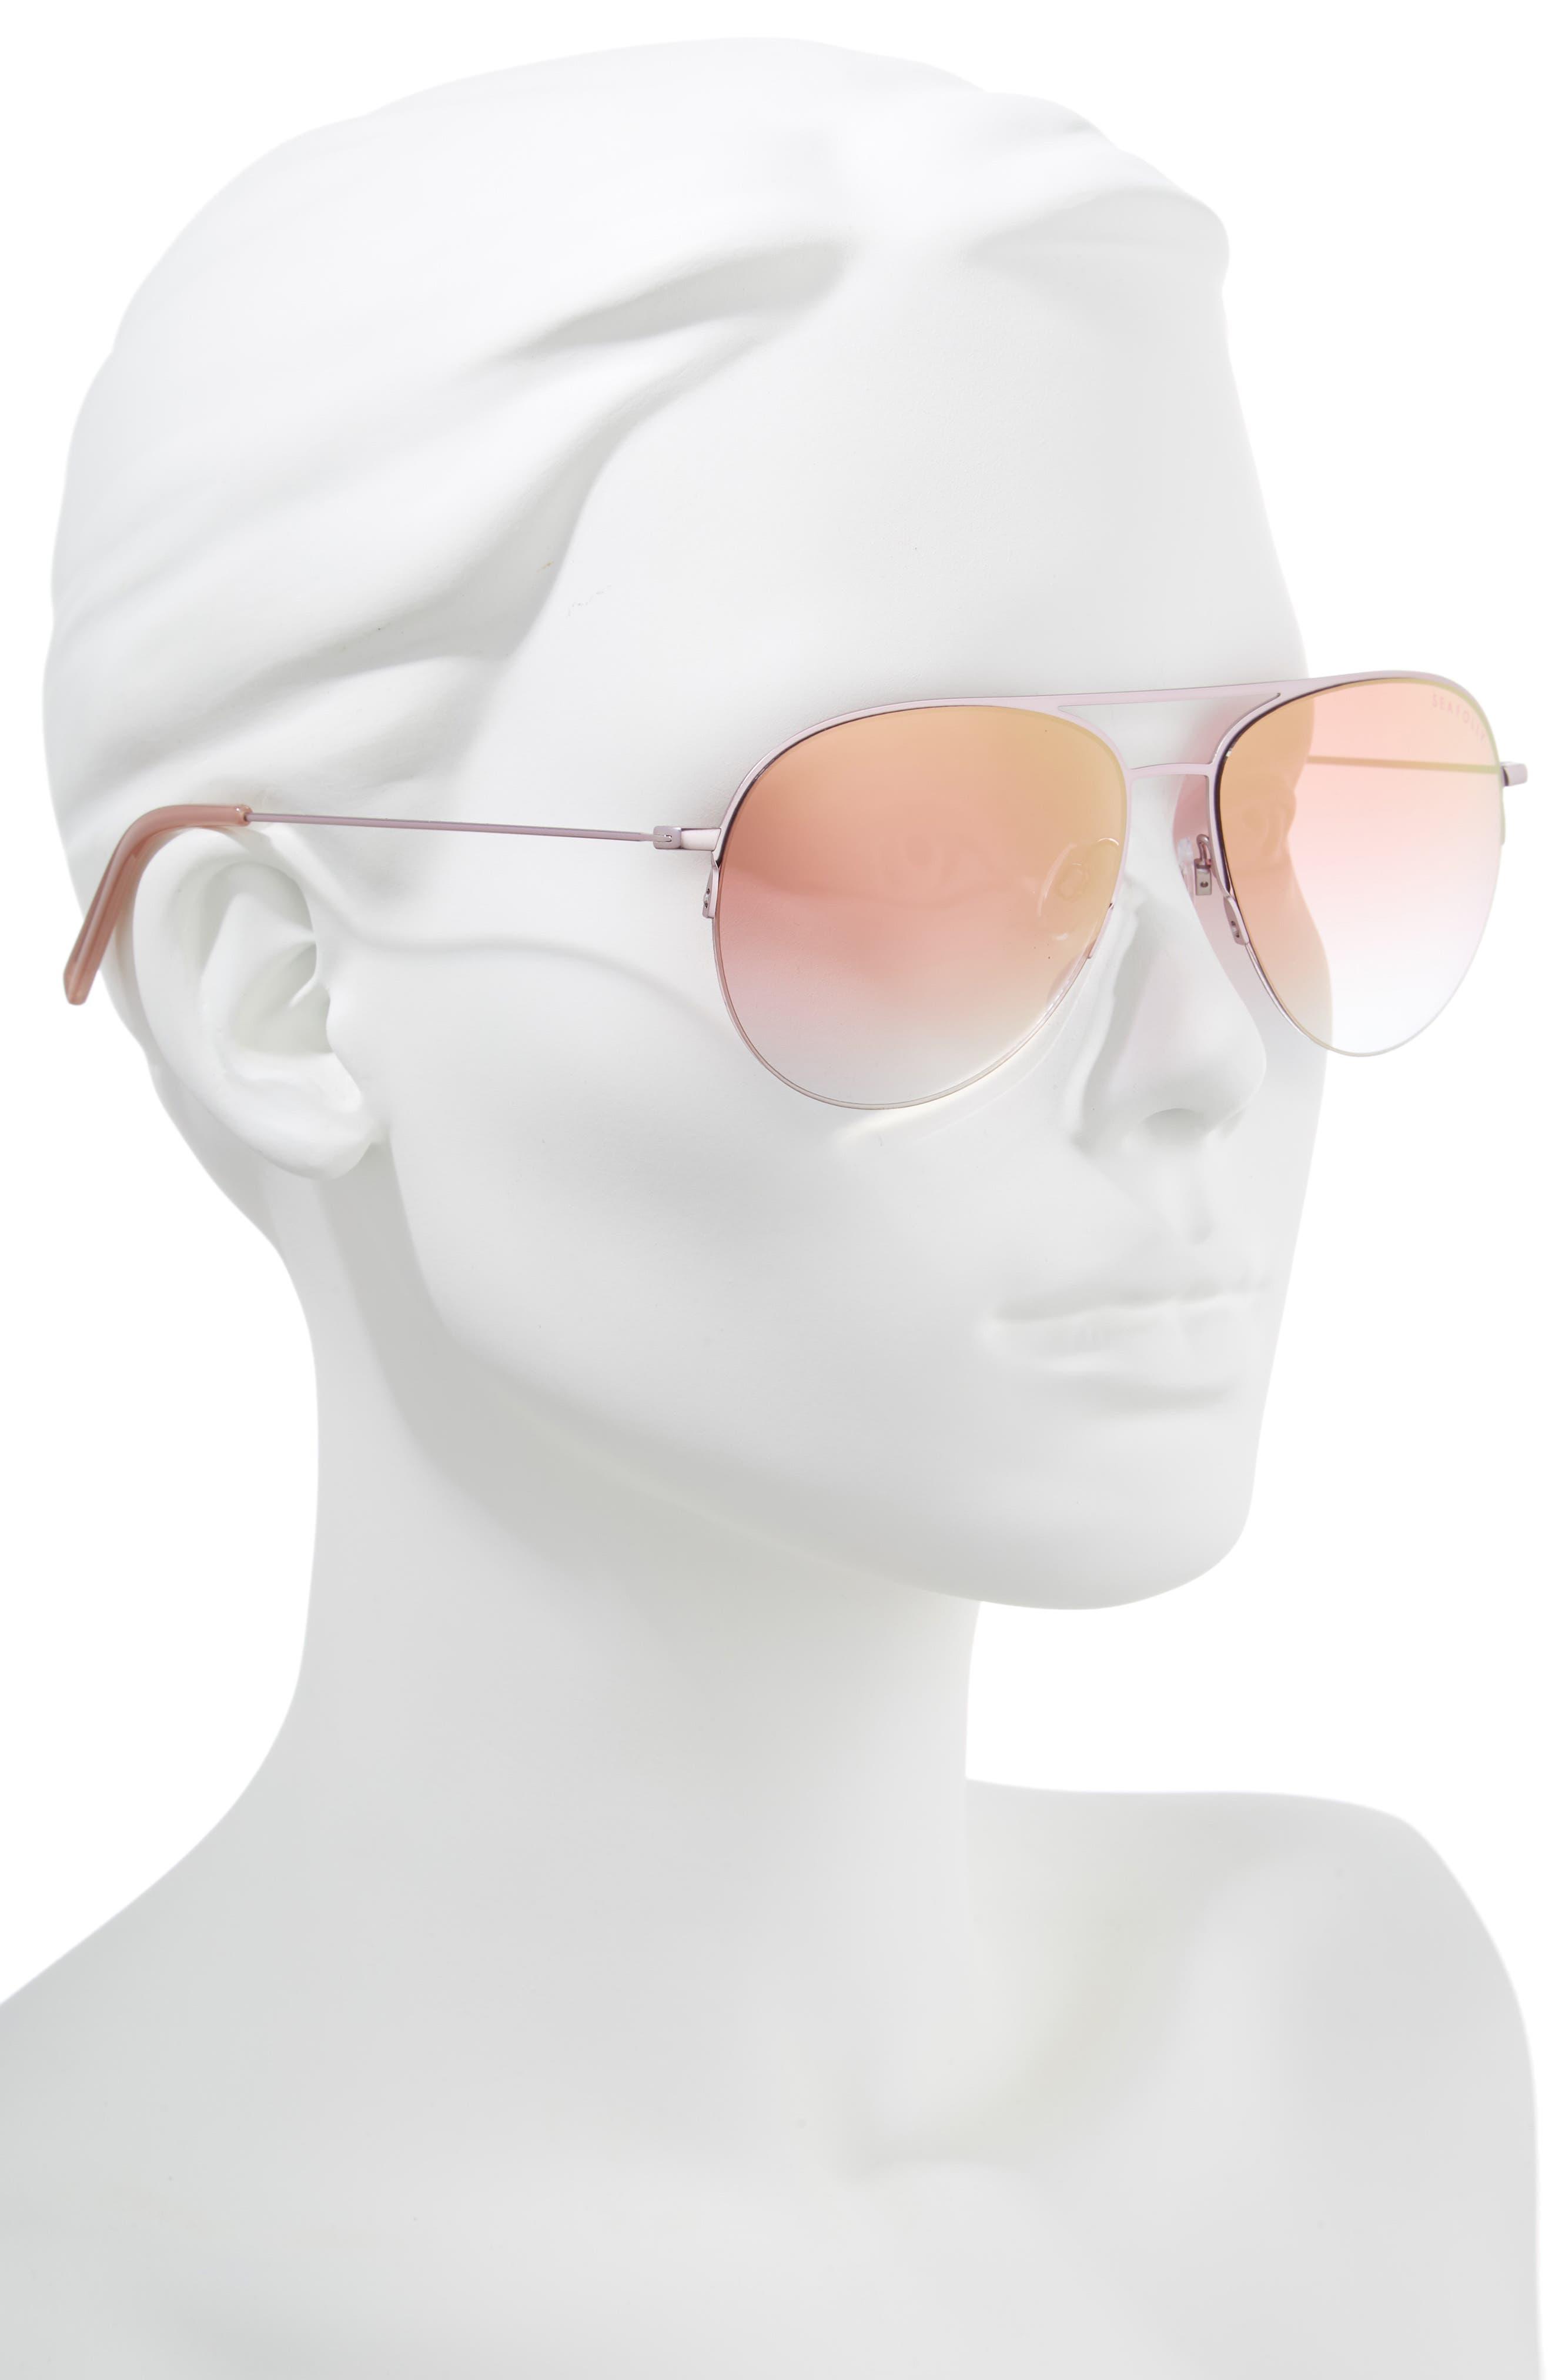 Tamarama 60mm Aviator Sunglasses,                             Alternate thumbnail 2, color,                             612